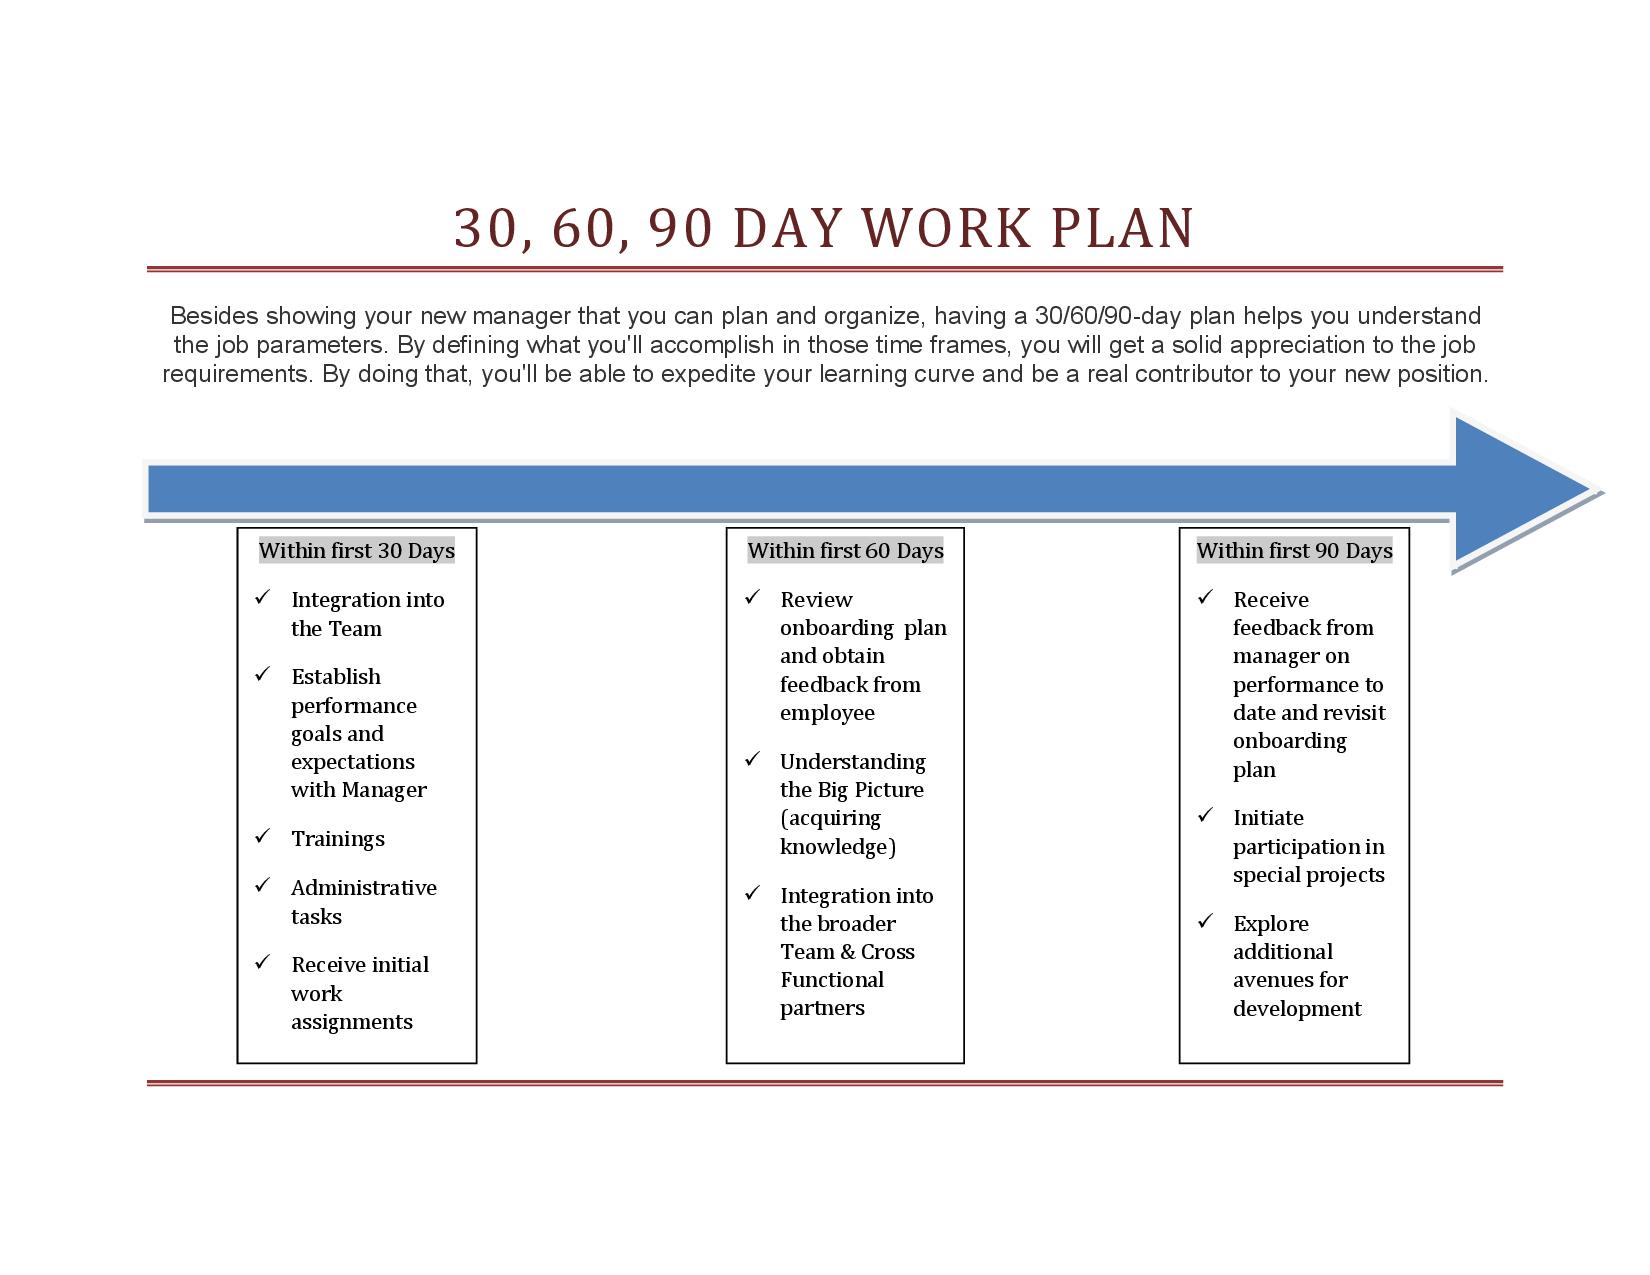 30 60 90 Day Work Plan Template | 90 Day Plan, How To Plan Regarding 30 60 90 Day Plan Template Word